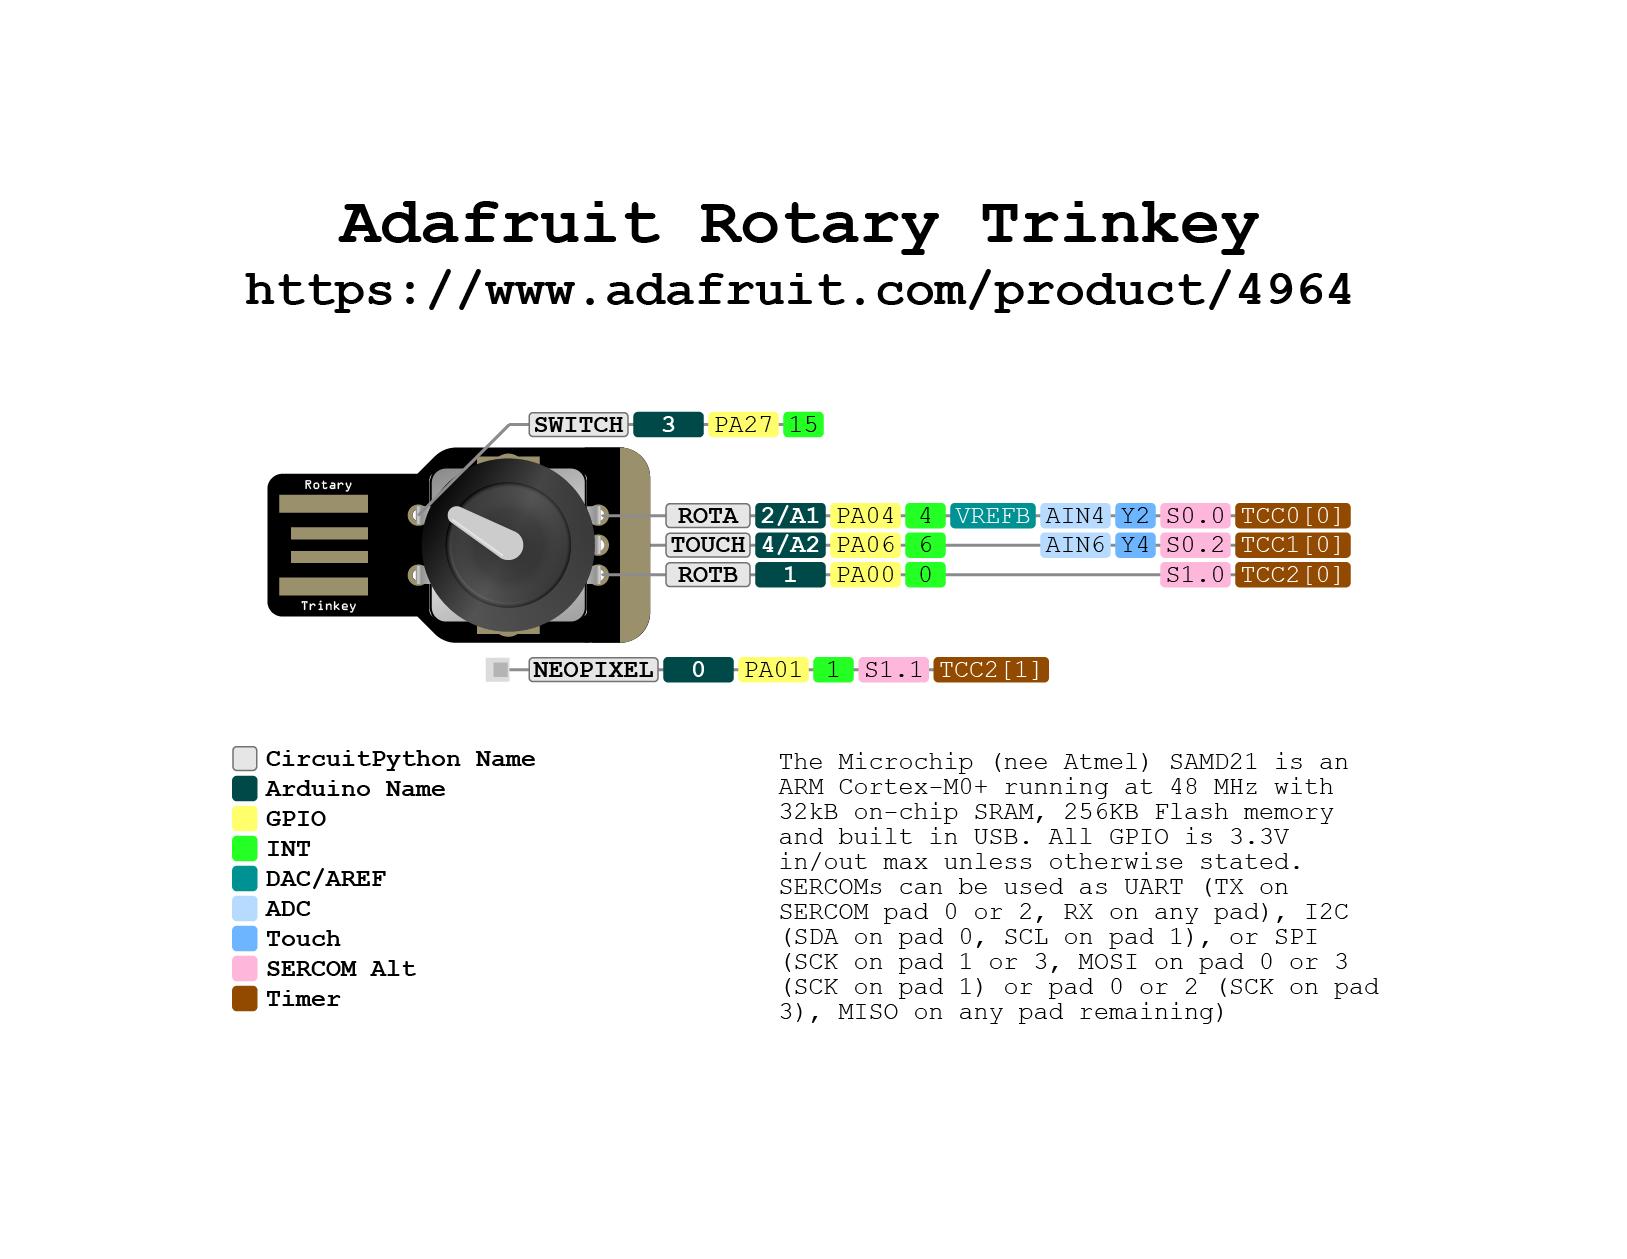 adafruit_products_Adafruit_Rotary_Trinkey_Pinout.png